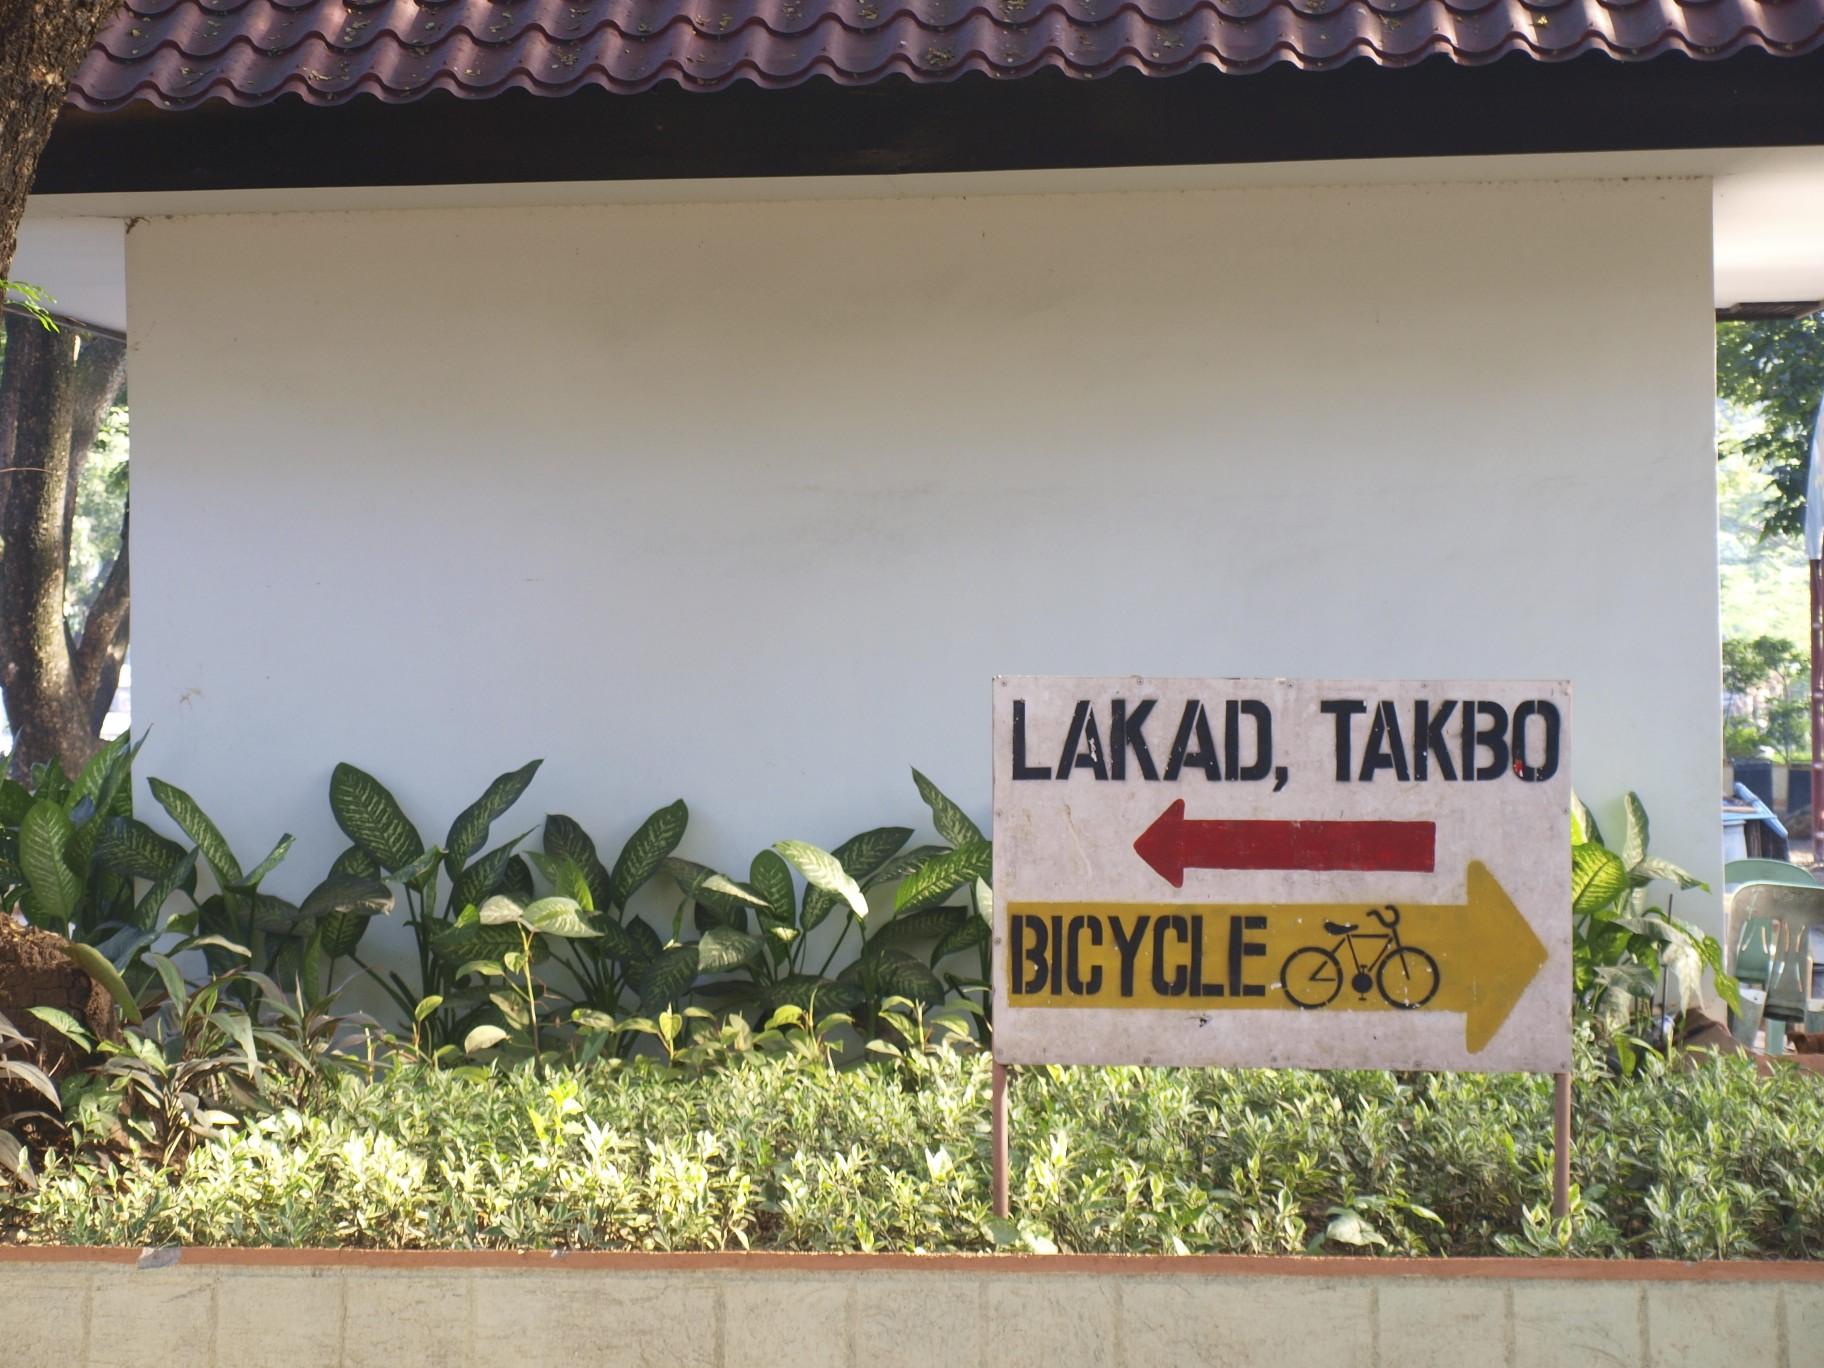 Lakad Takbo, Arrow, Bicycle, Directions, Signs, HQ Photo